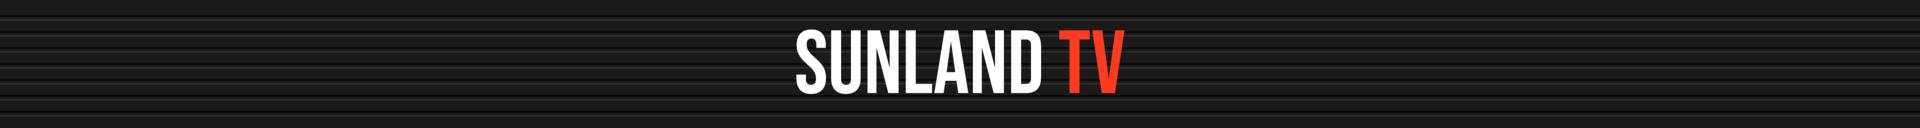 Sunland Tv